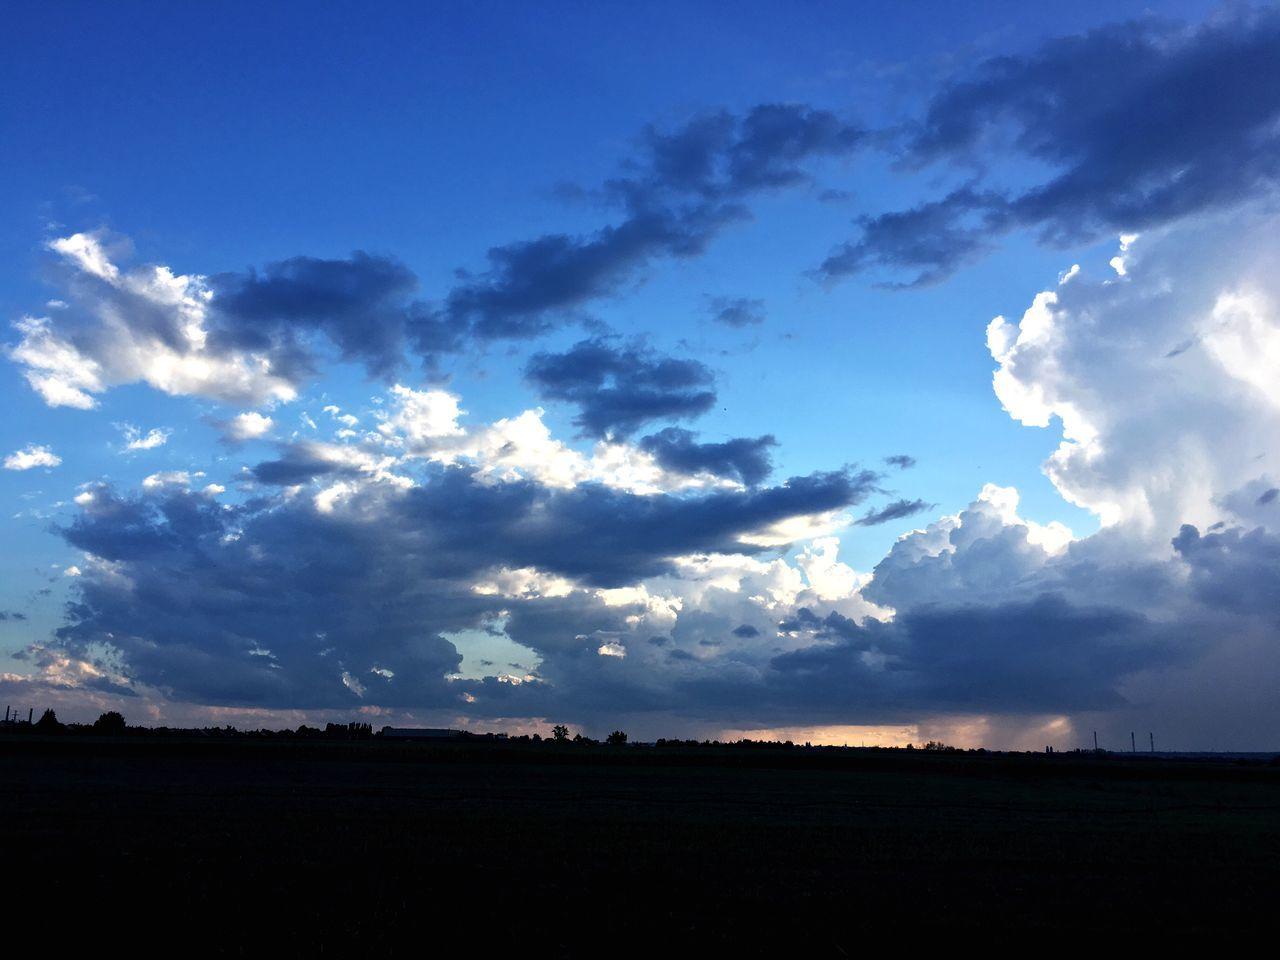 Felhők Clouds Clouds And Sky Cloud - Sky Nature Nature Photography Természet Landscape Blue Beauty In Nature Sky